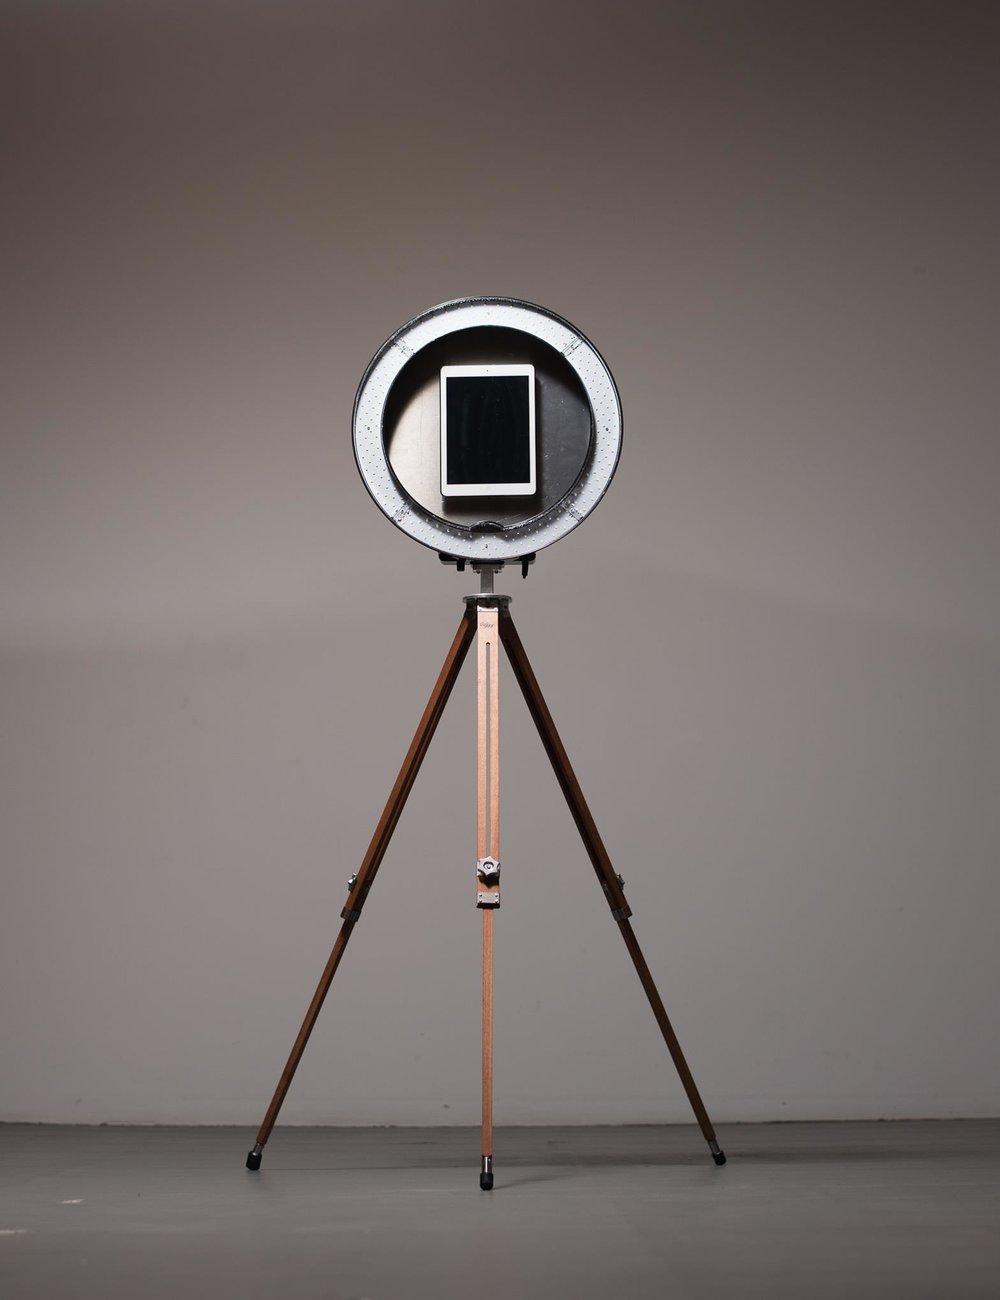 Macon Photo Booth